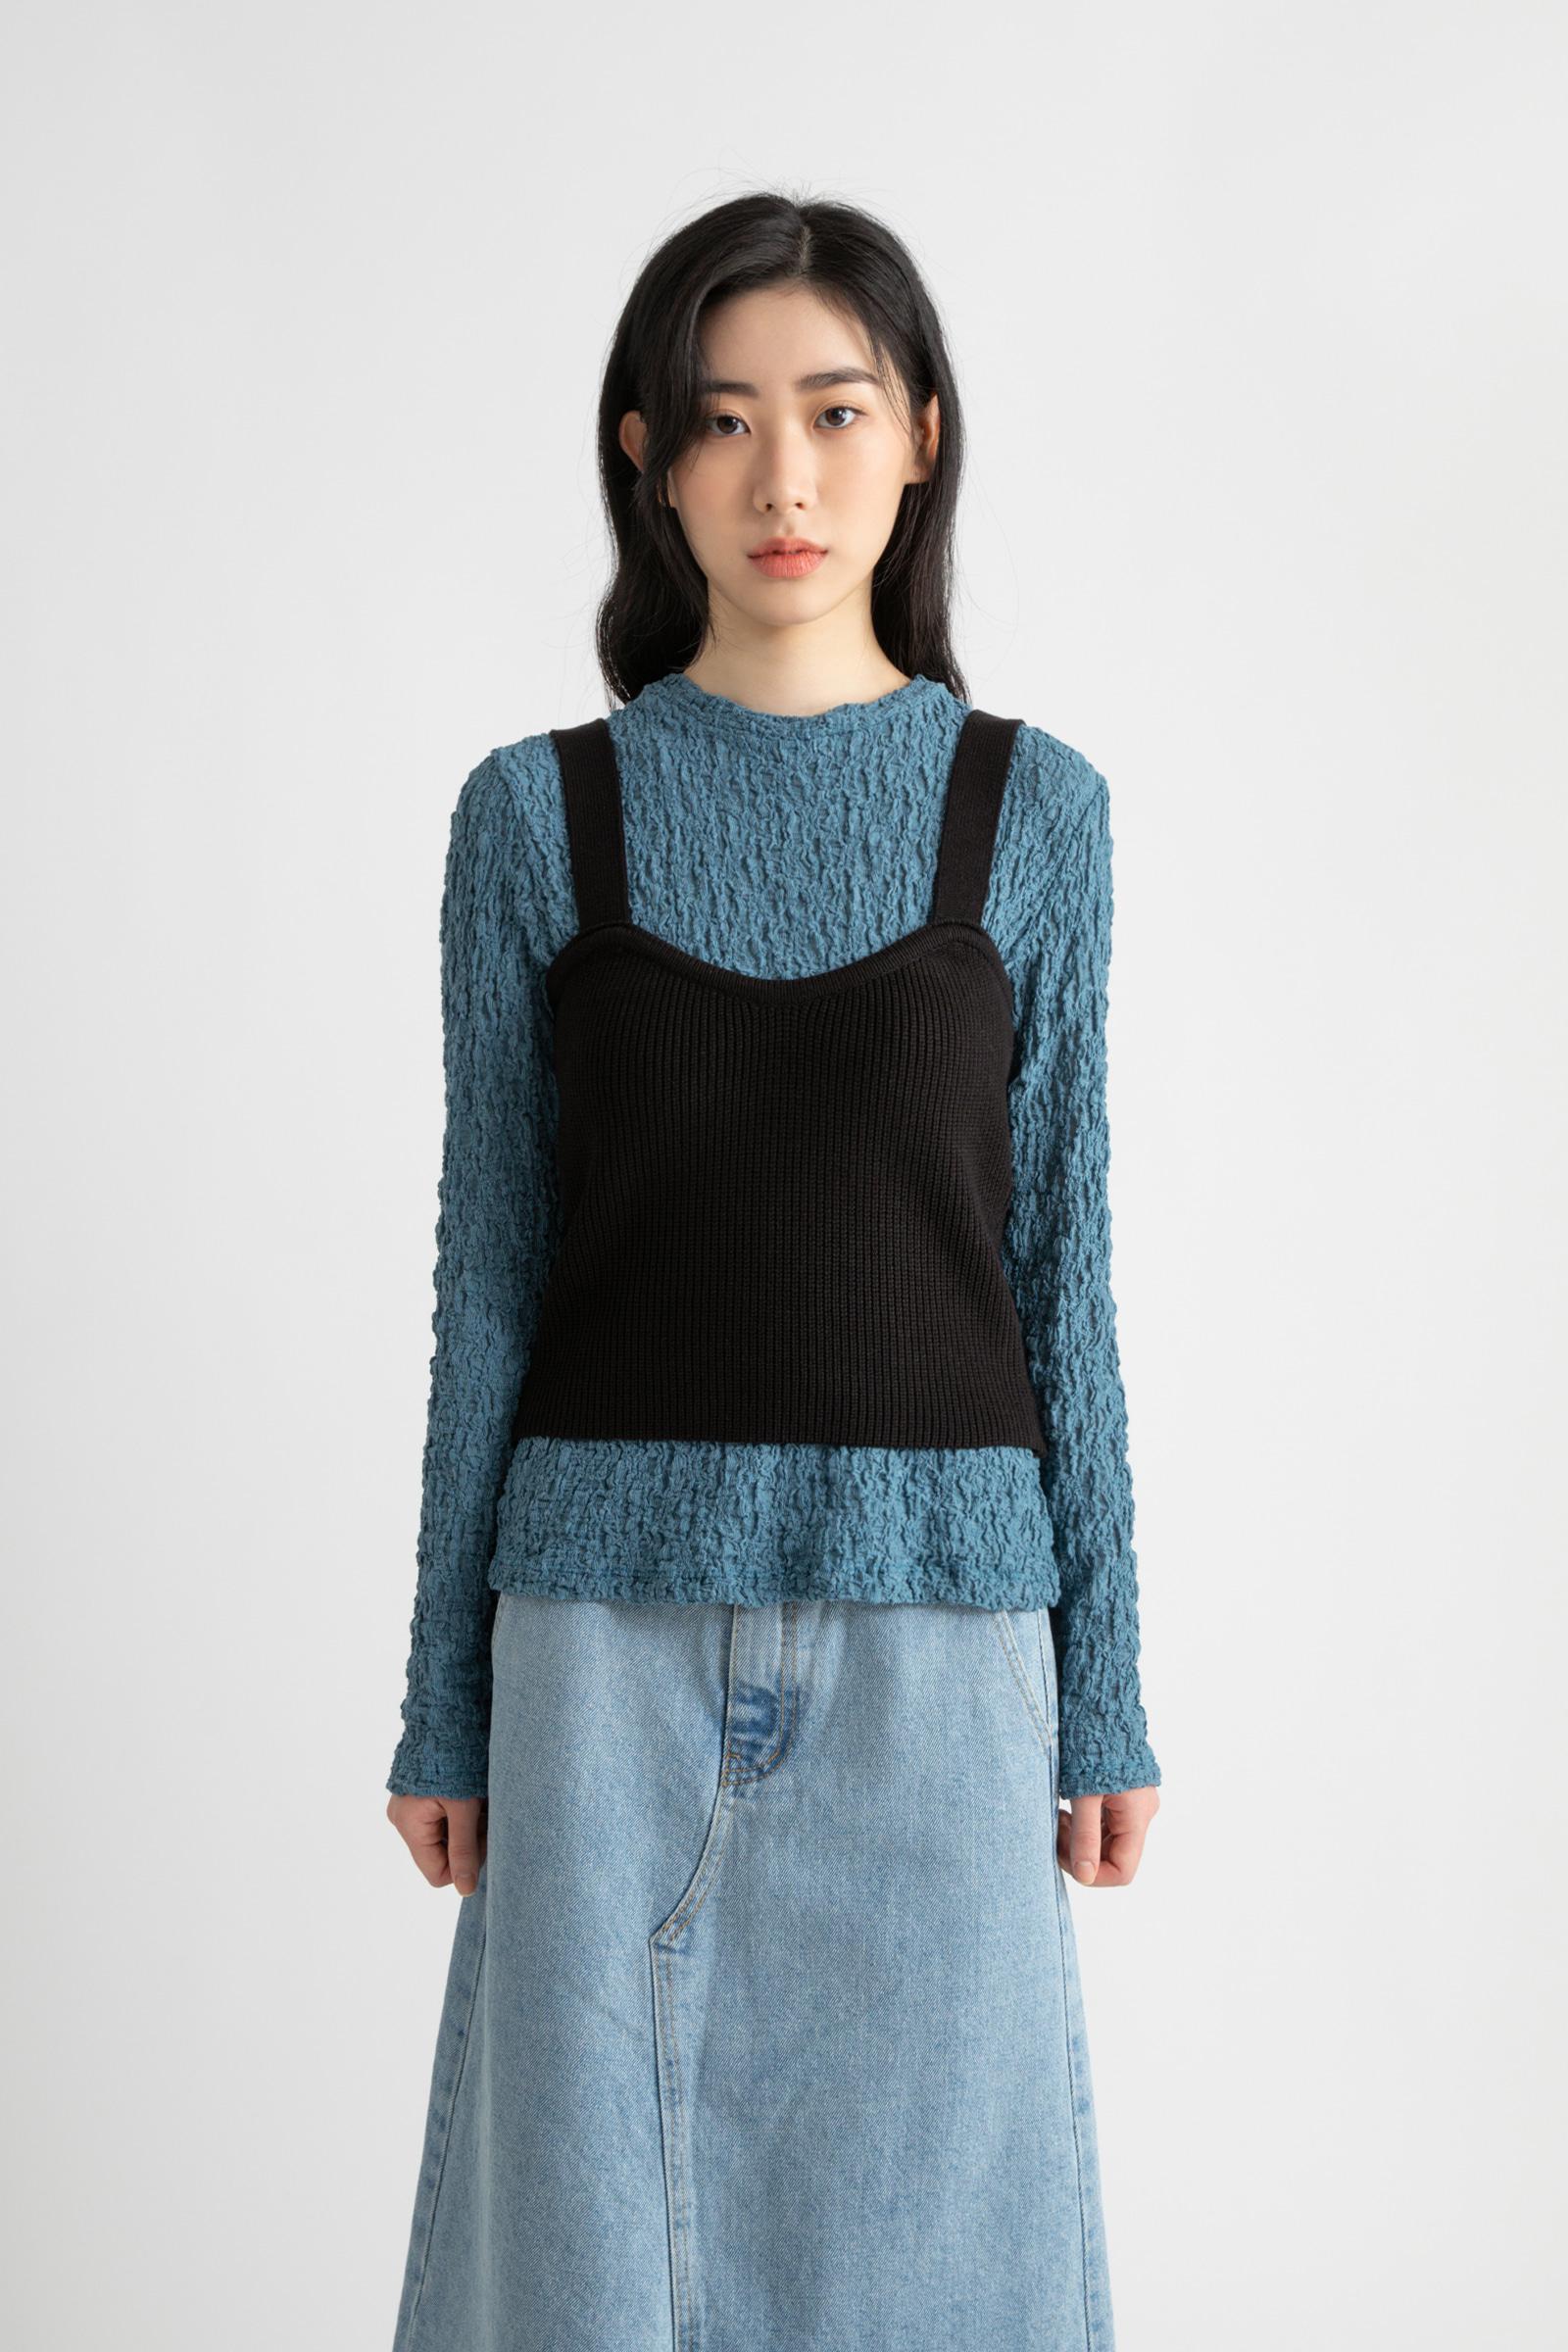 Dare wool-knit layered top